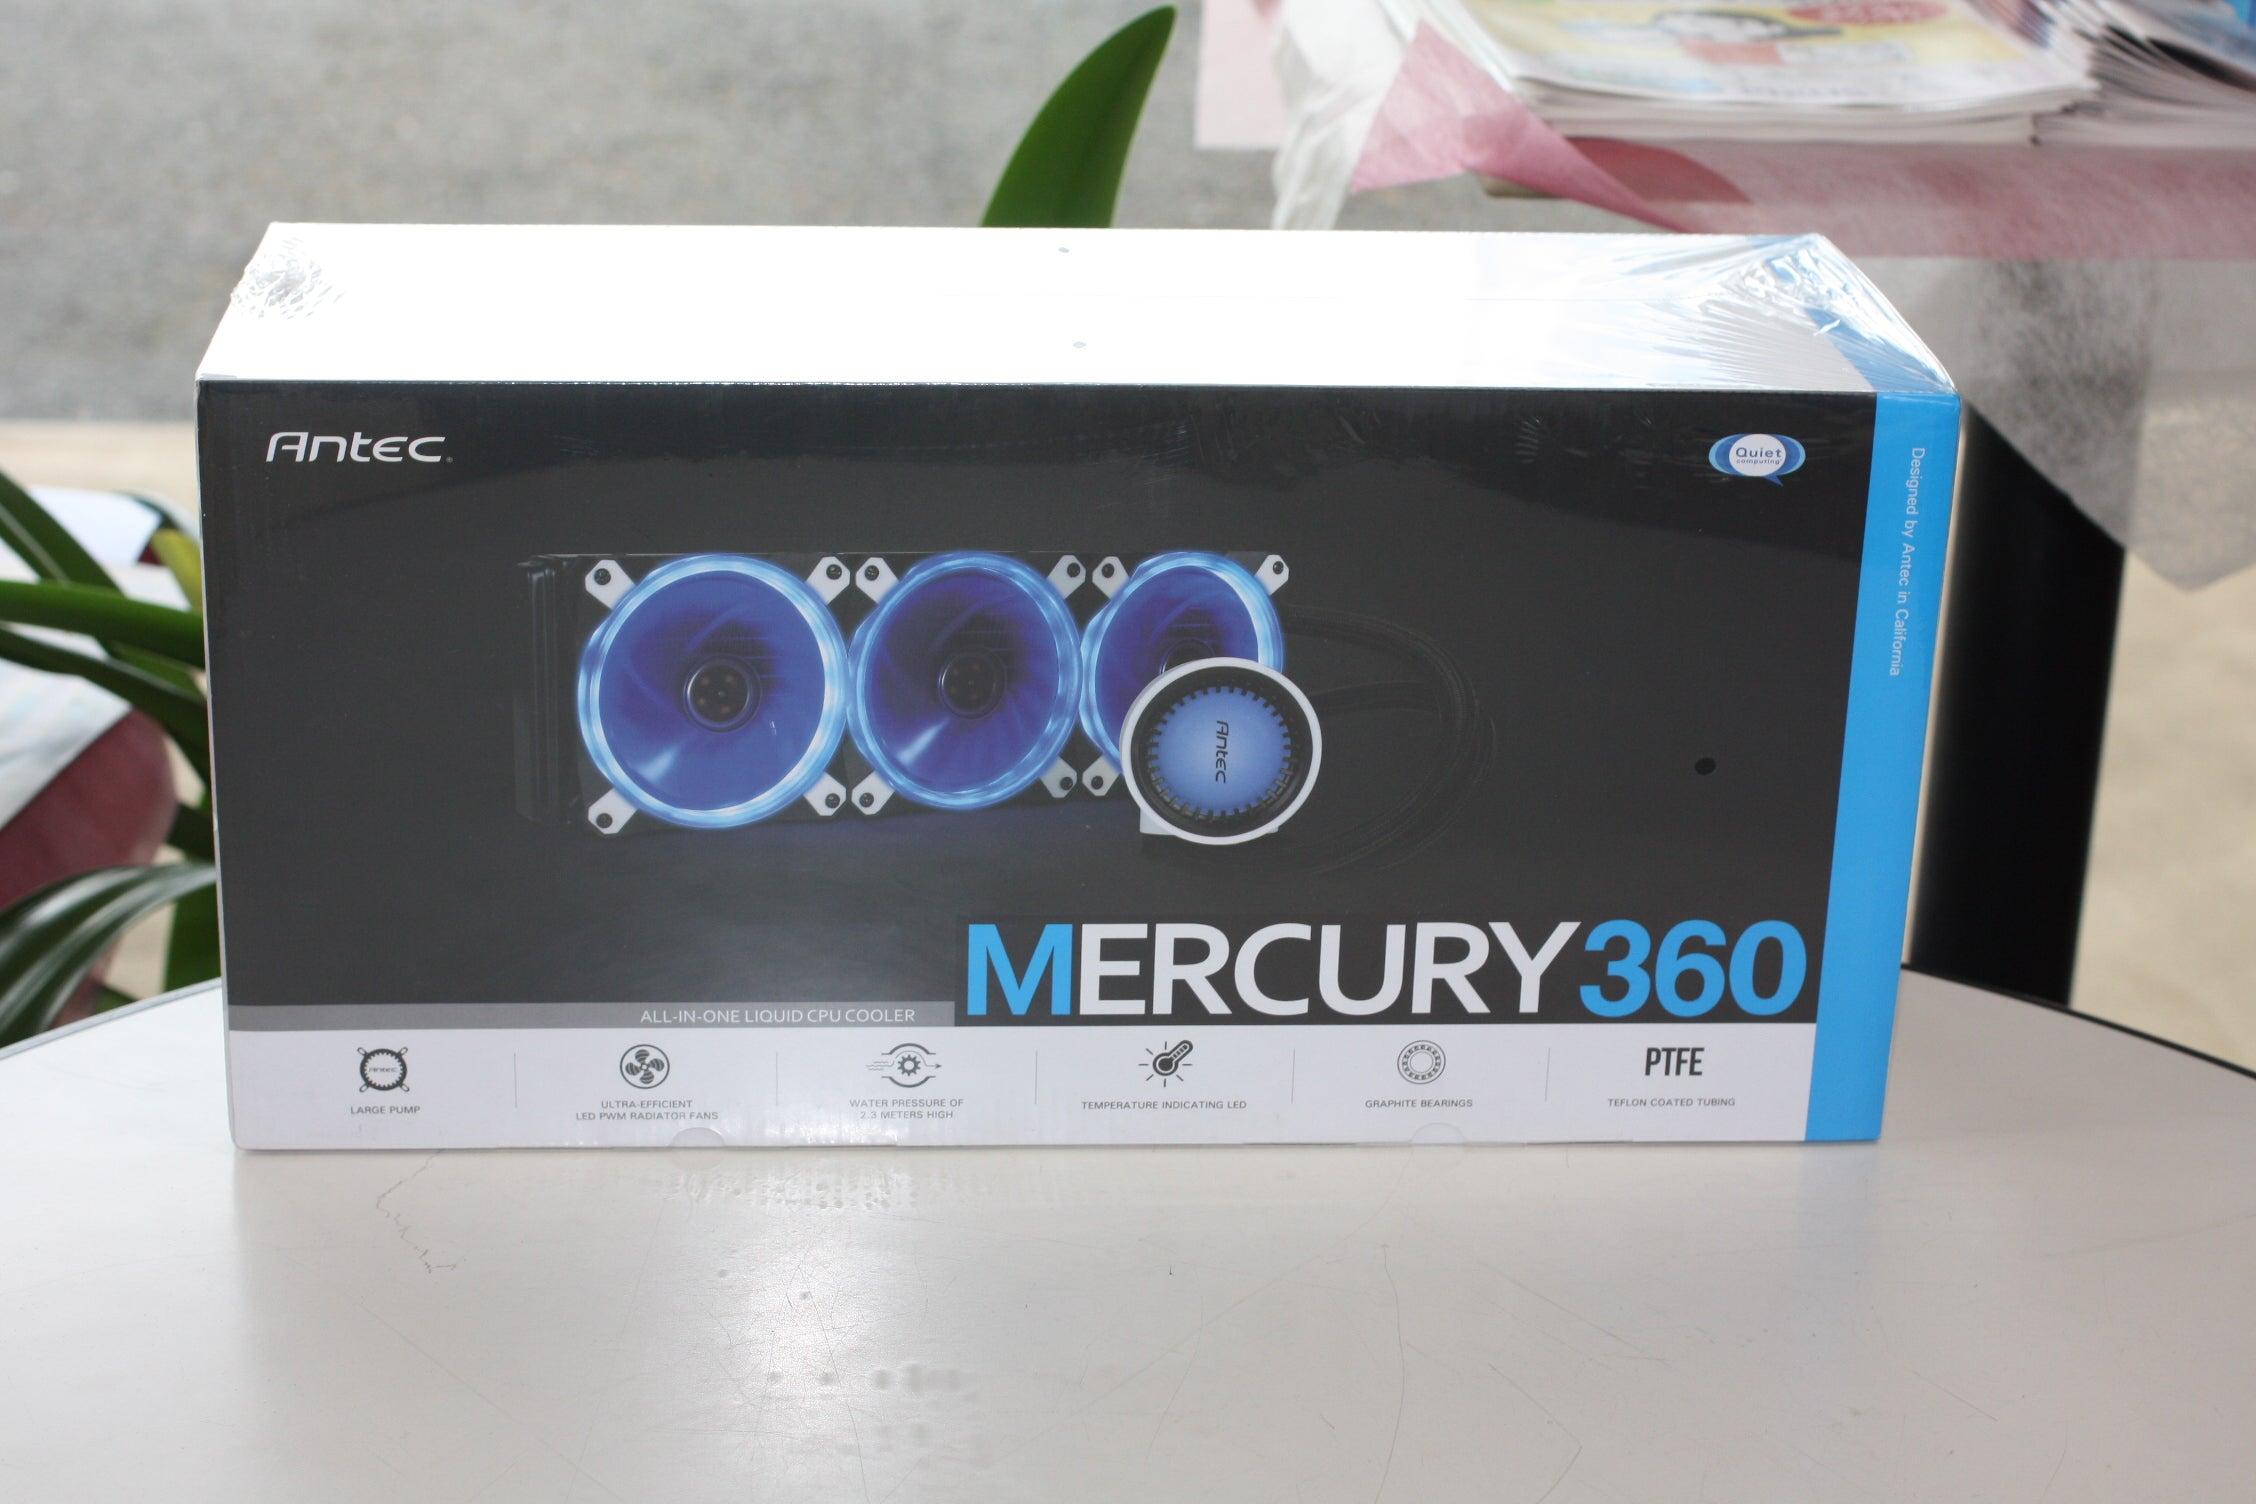 【Mercury360 RGB】 SYNC対応の水冷一体型ユニット ASUS AURA